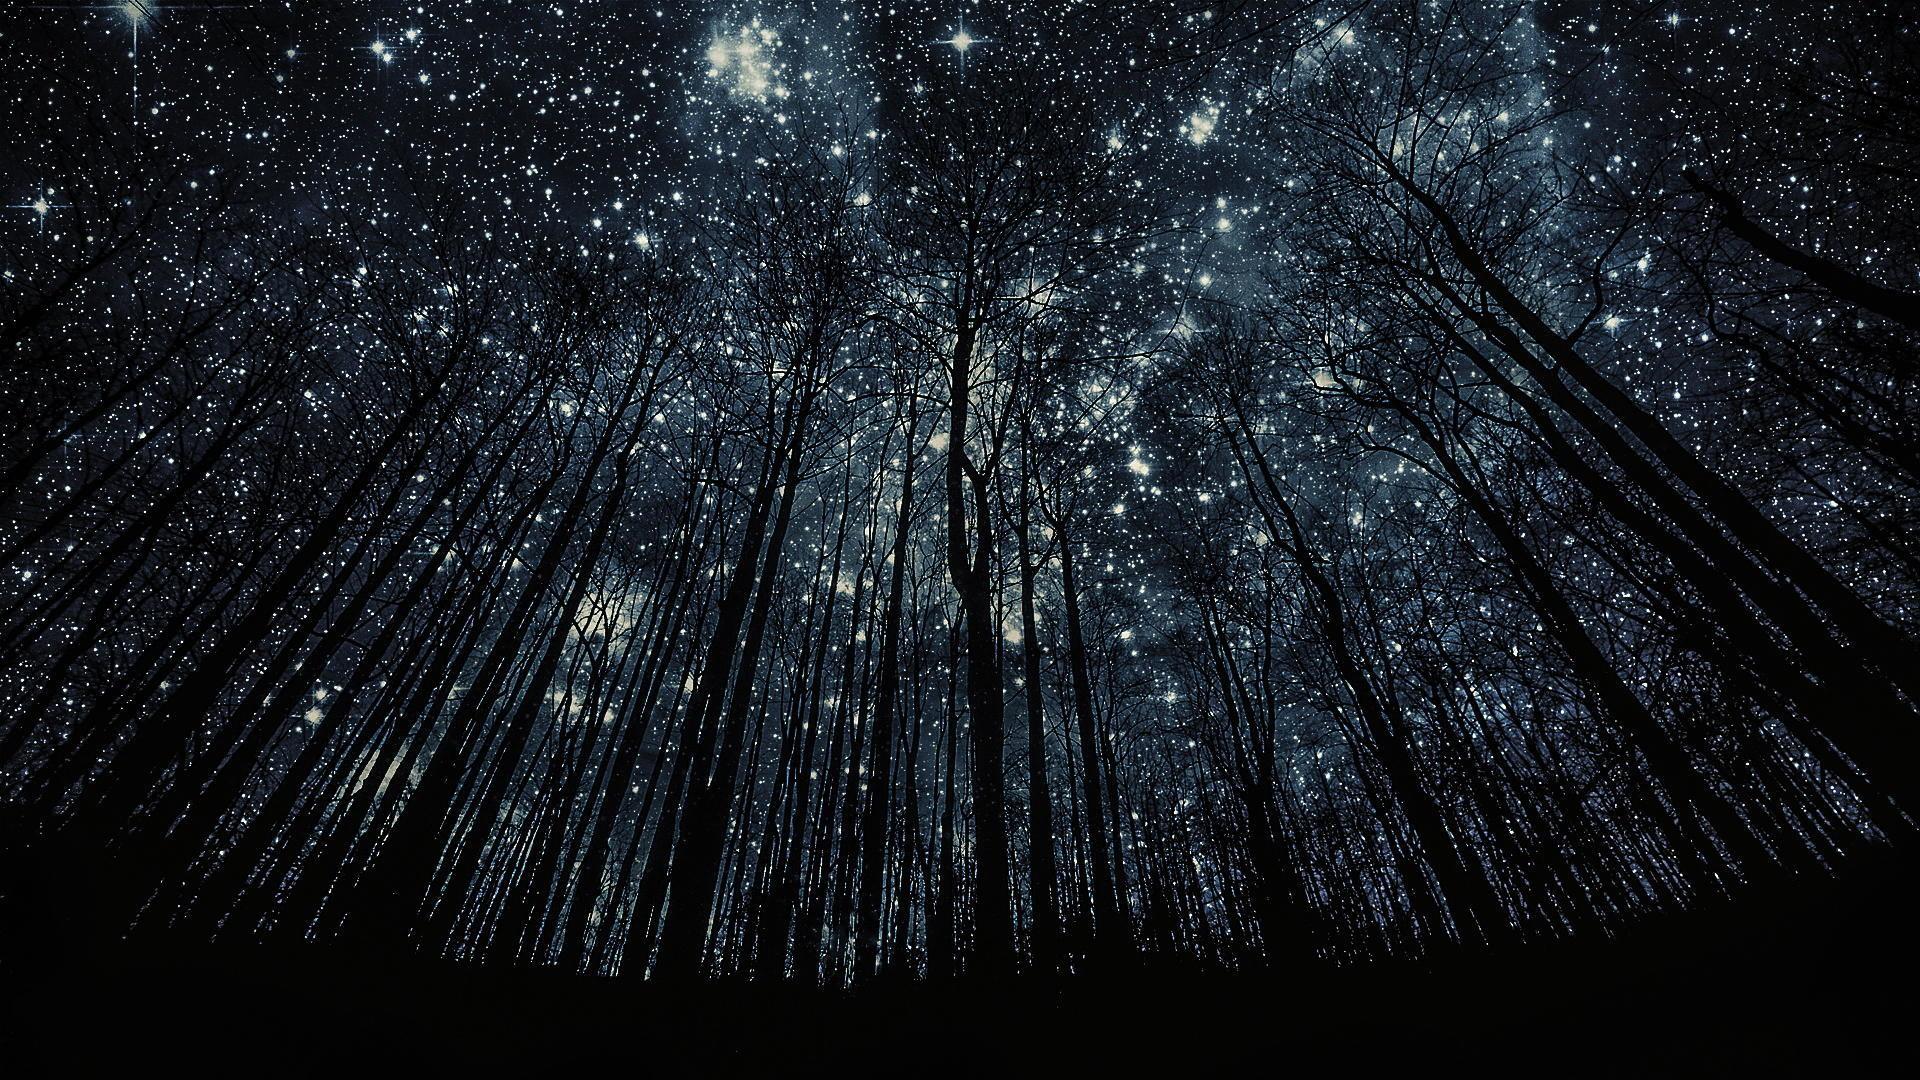 hd wallpaper night sky 70 images